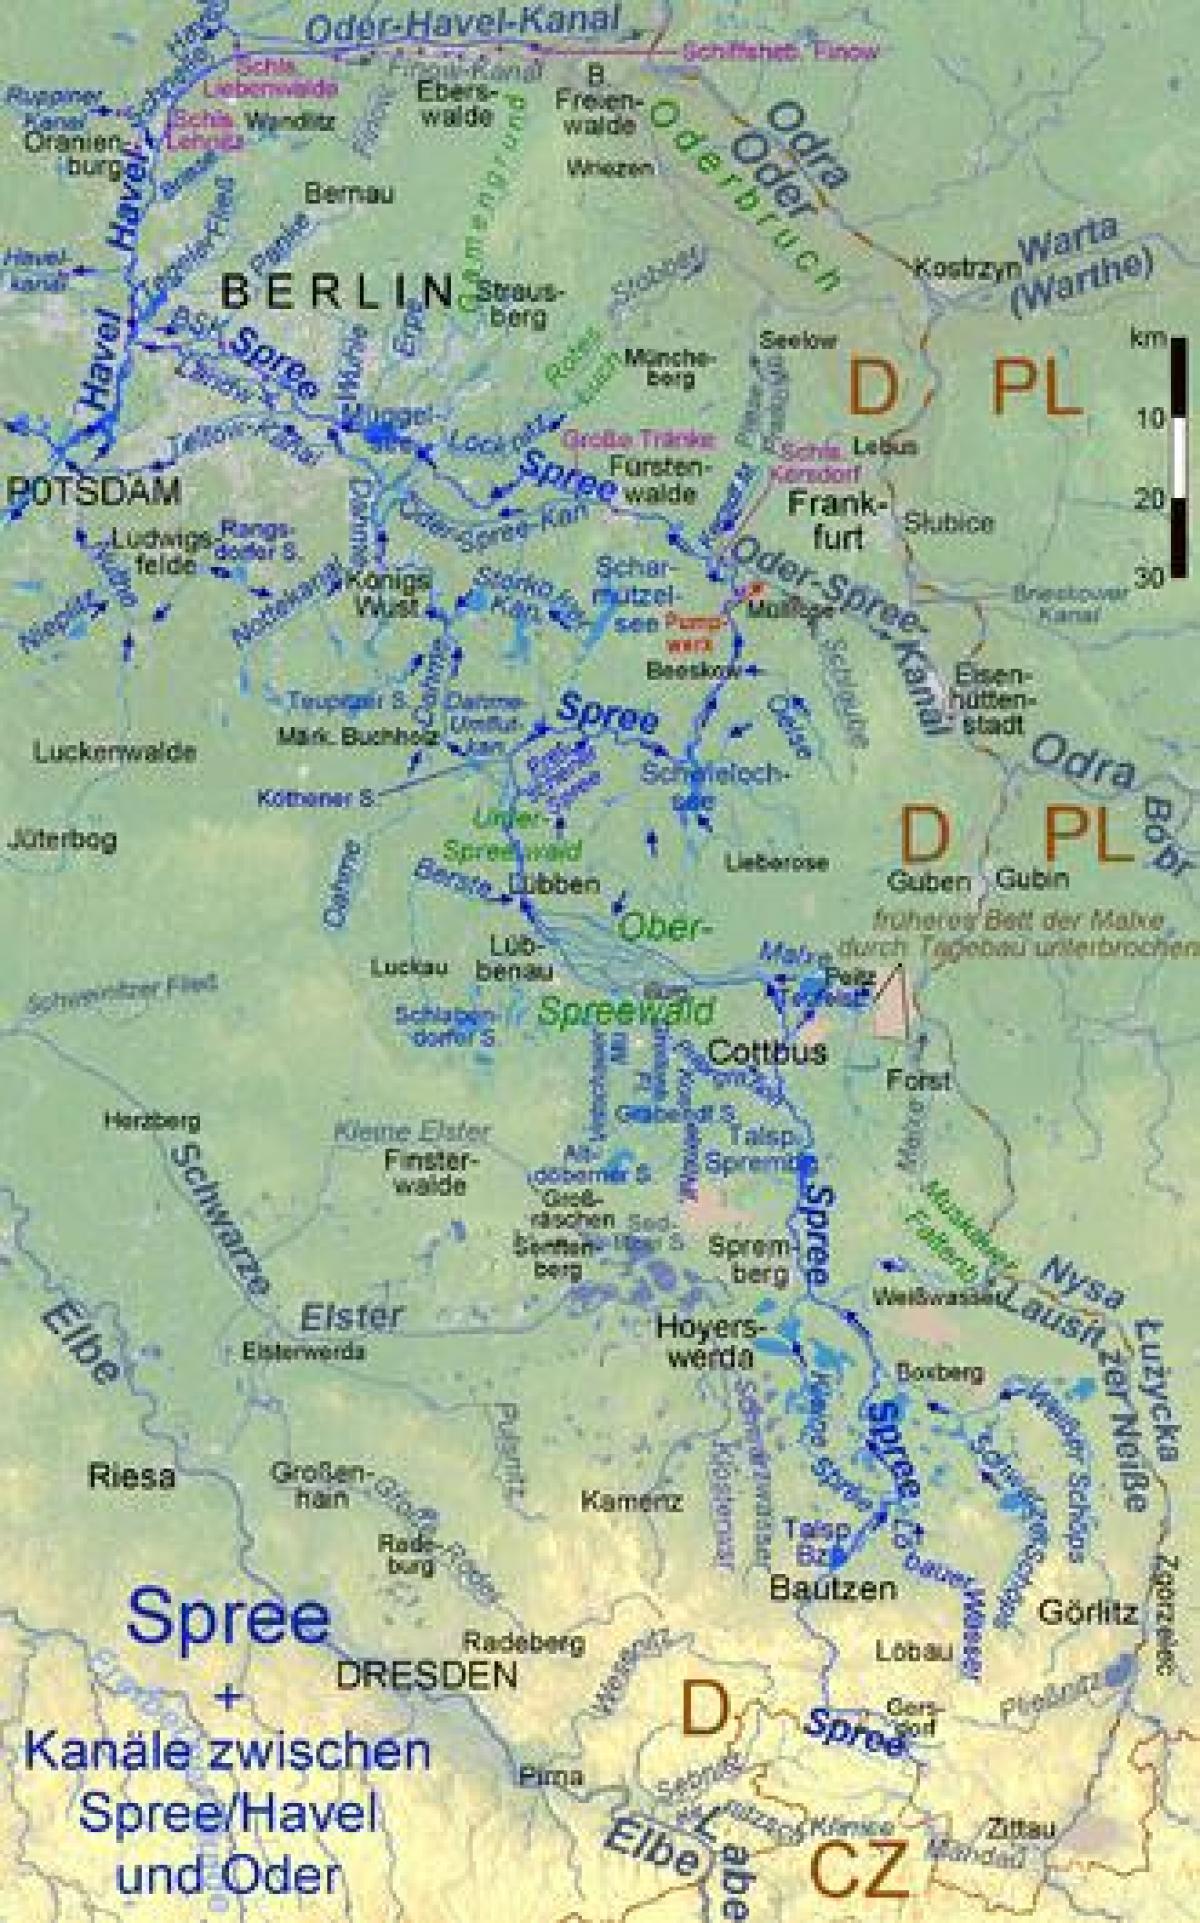 Germania Cartina Fiumi.Berlino Fiumi Mappa Cartina Di Berlino Fiumi Germania